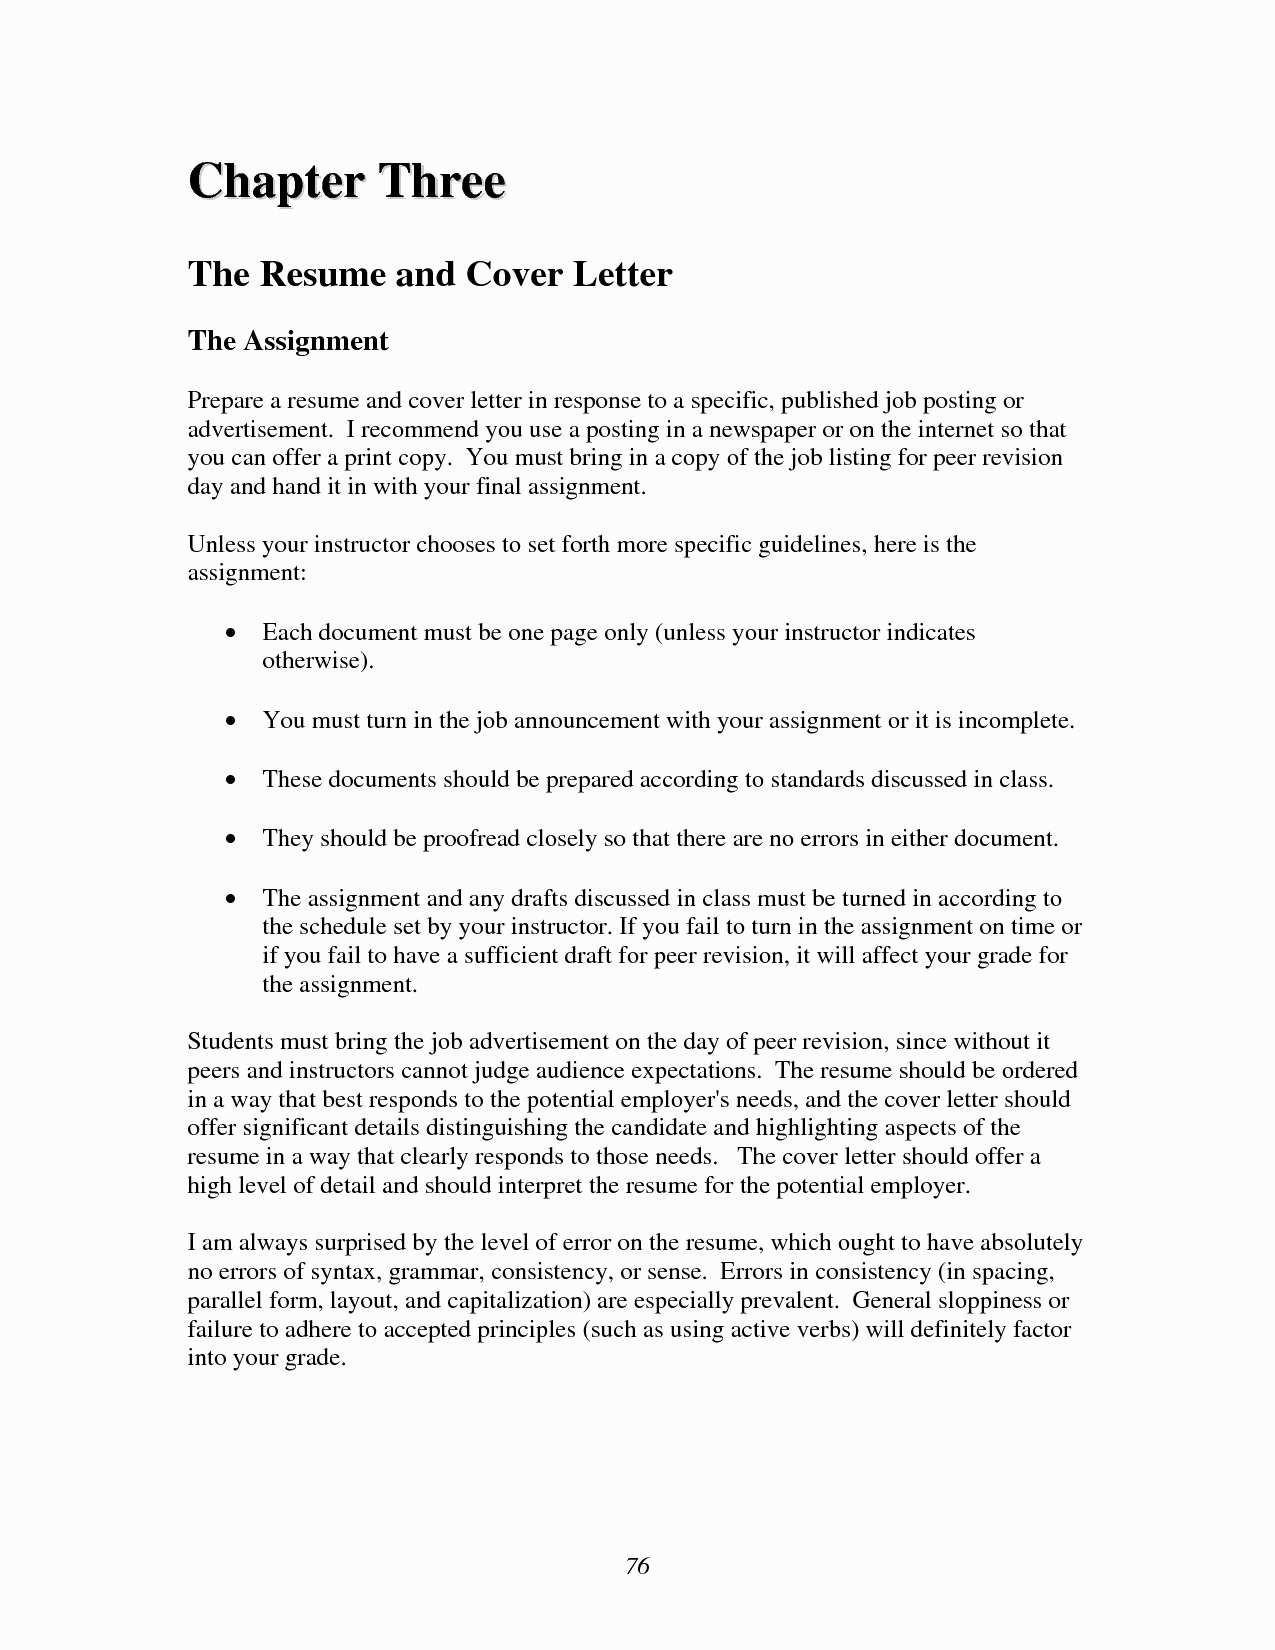 Asset Management Cover Letter Template - Resume and Cover Letter Template Beautiful Fresh Job Fer Letter